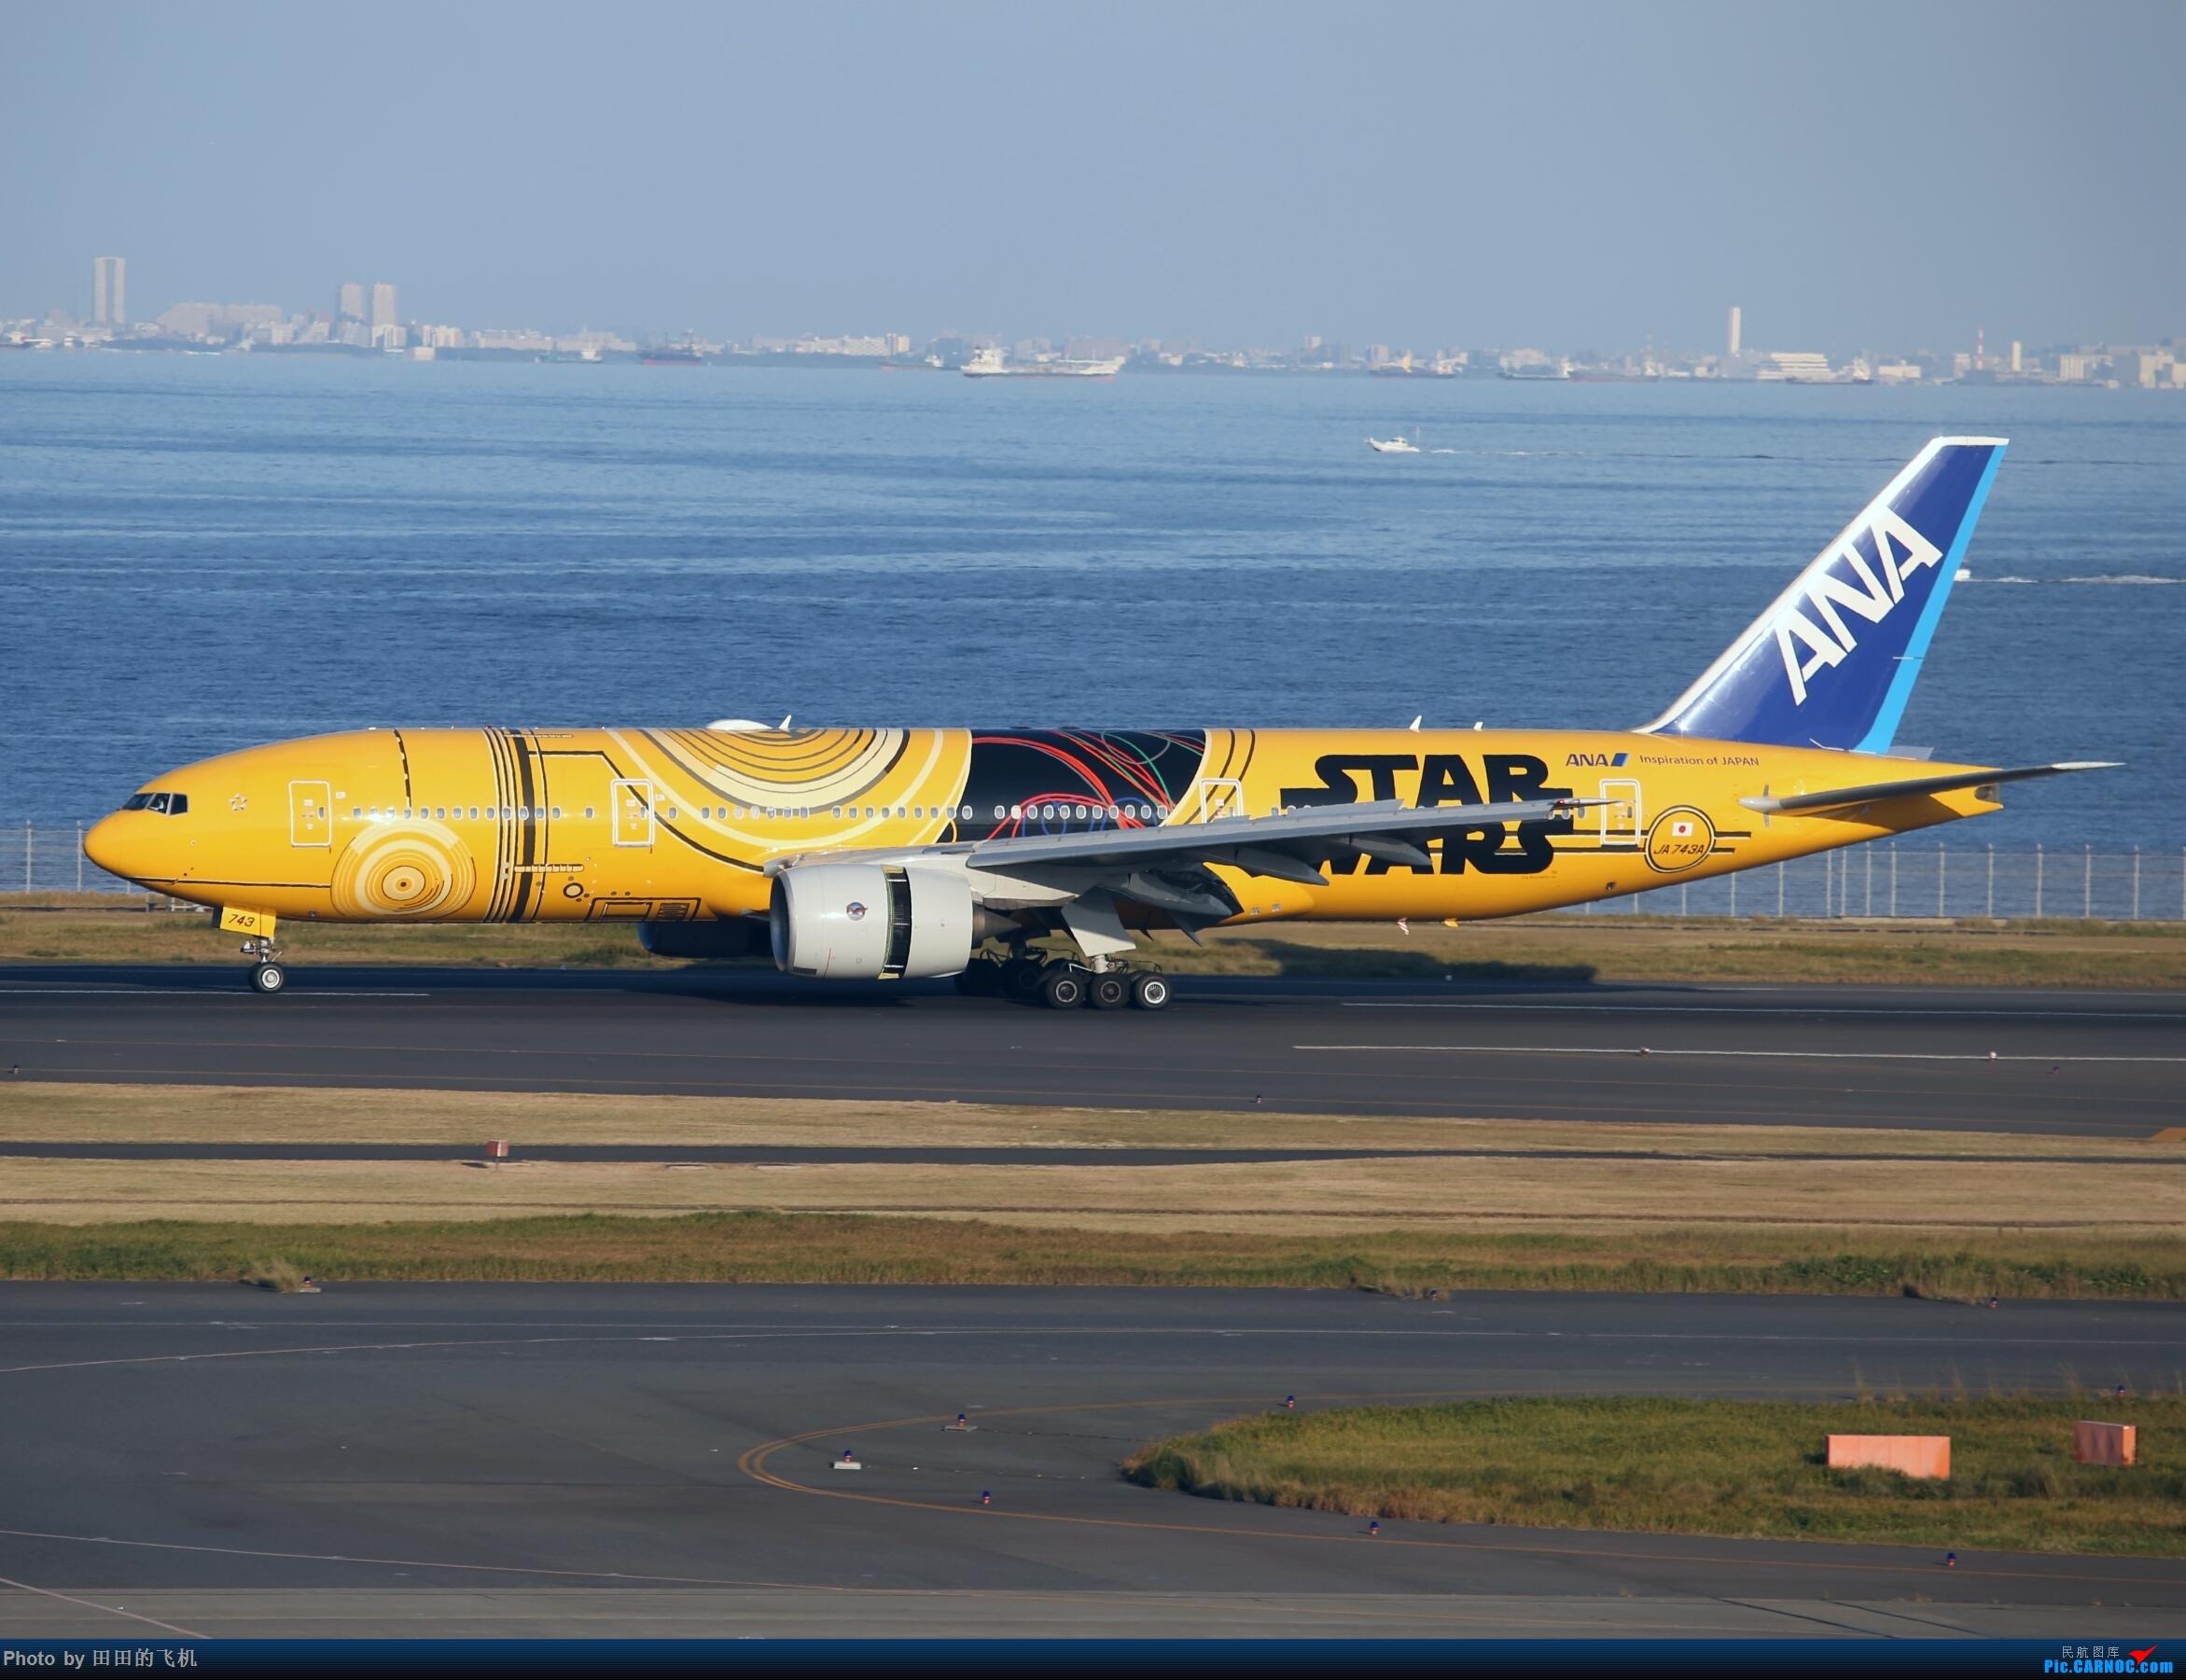 Re:[原创]整理一下去年东京羽田机场拍的飞机 777-200 JA743A 东京羽田机场